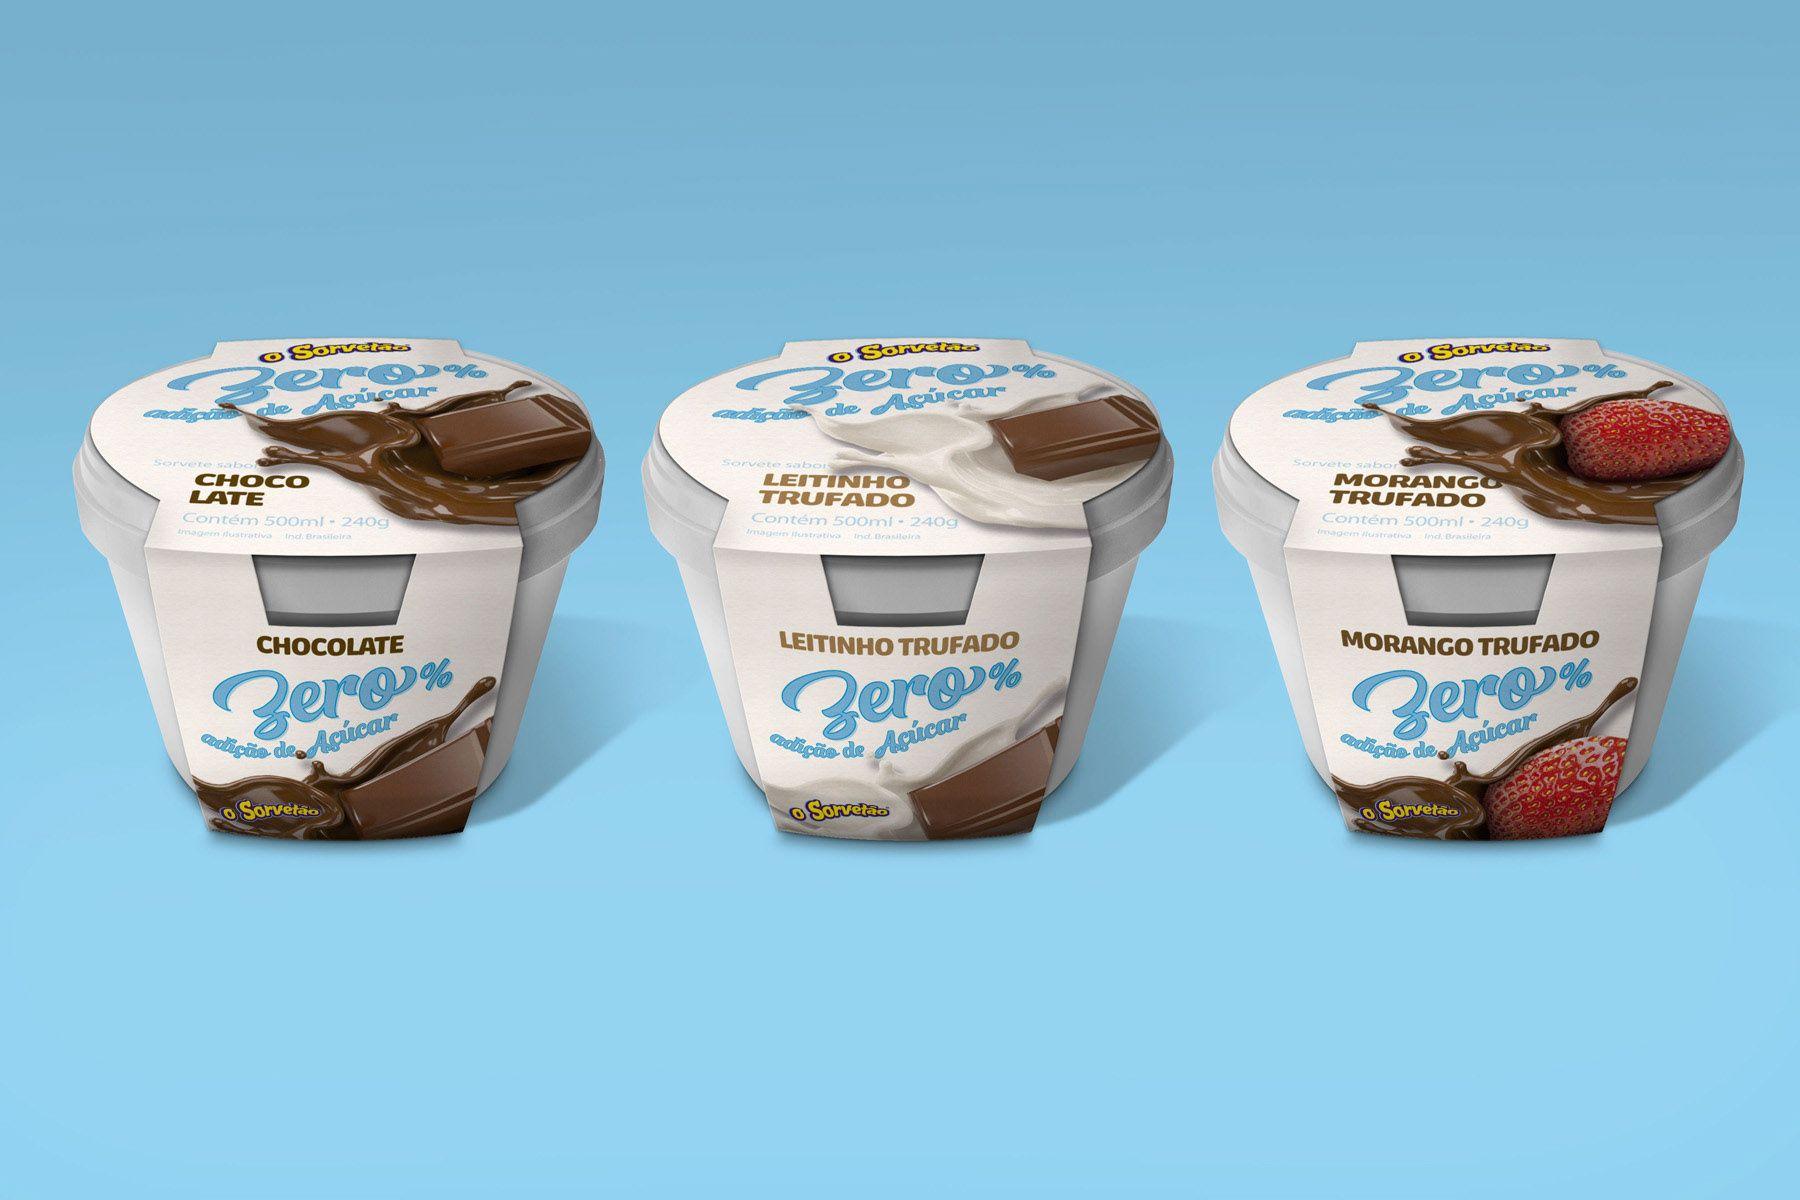 d6668c152 Embalagem para sorvetes Zero Lactose e Zero Açúcar on Behance ...